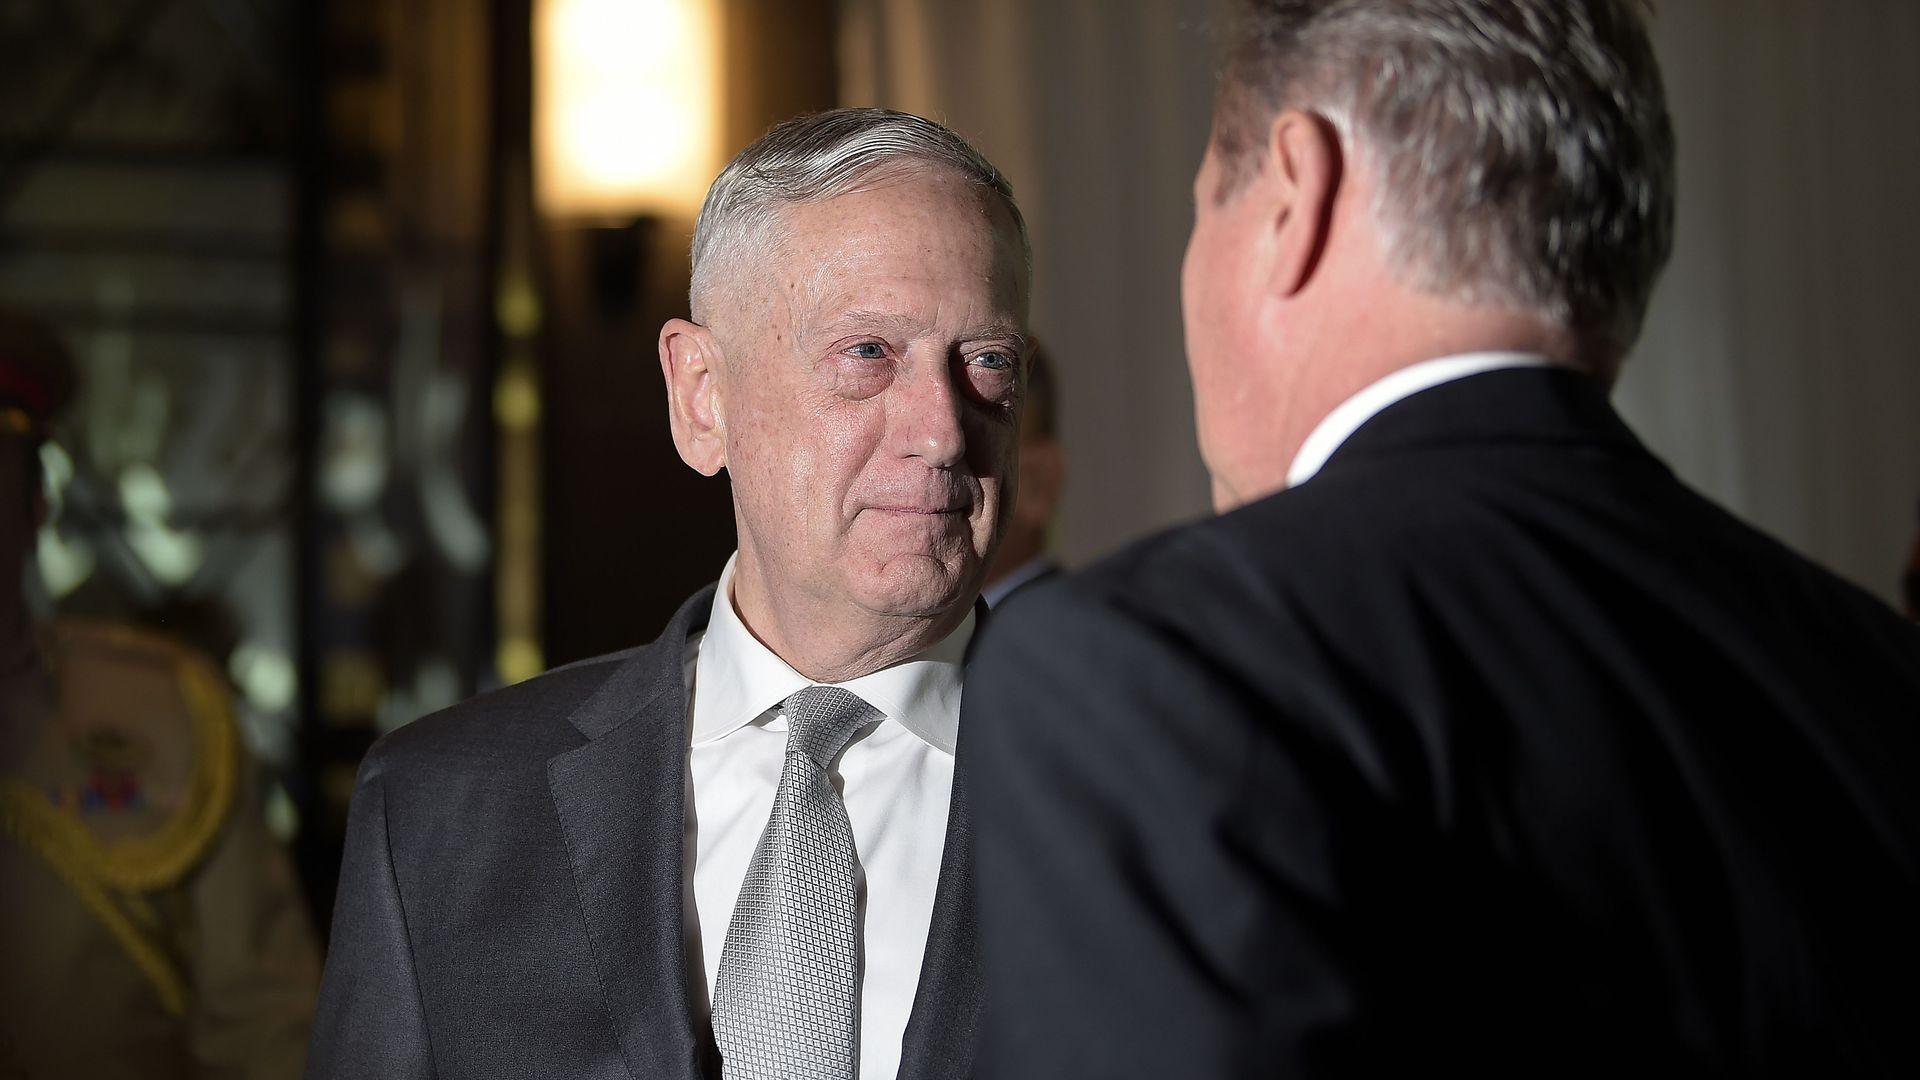 Mattis says Khashoggi's death has undermined Middle East